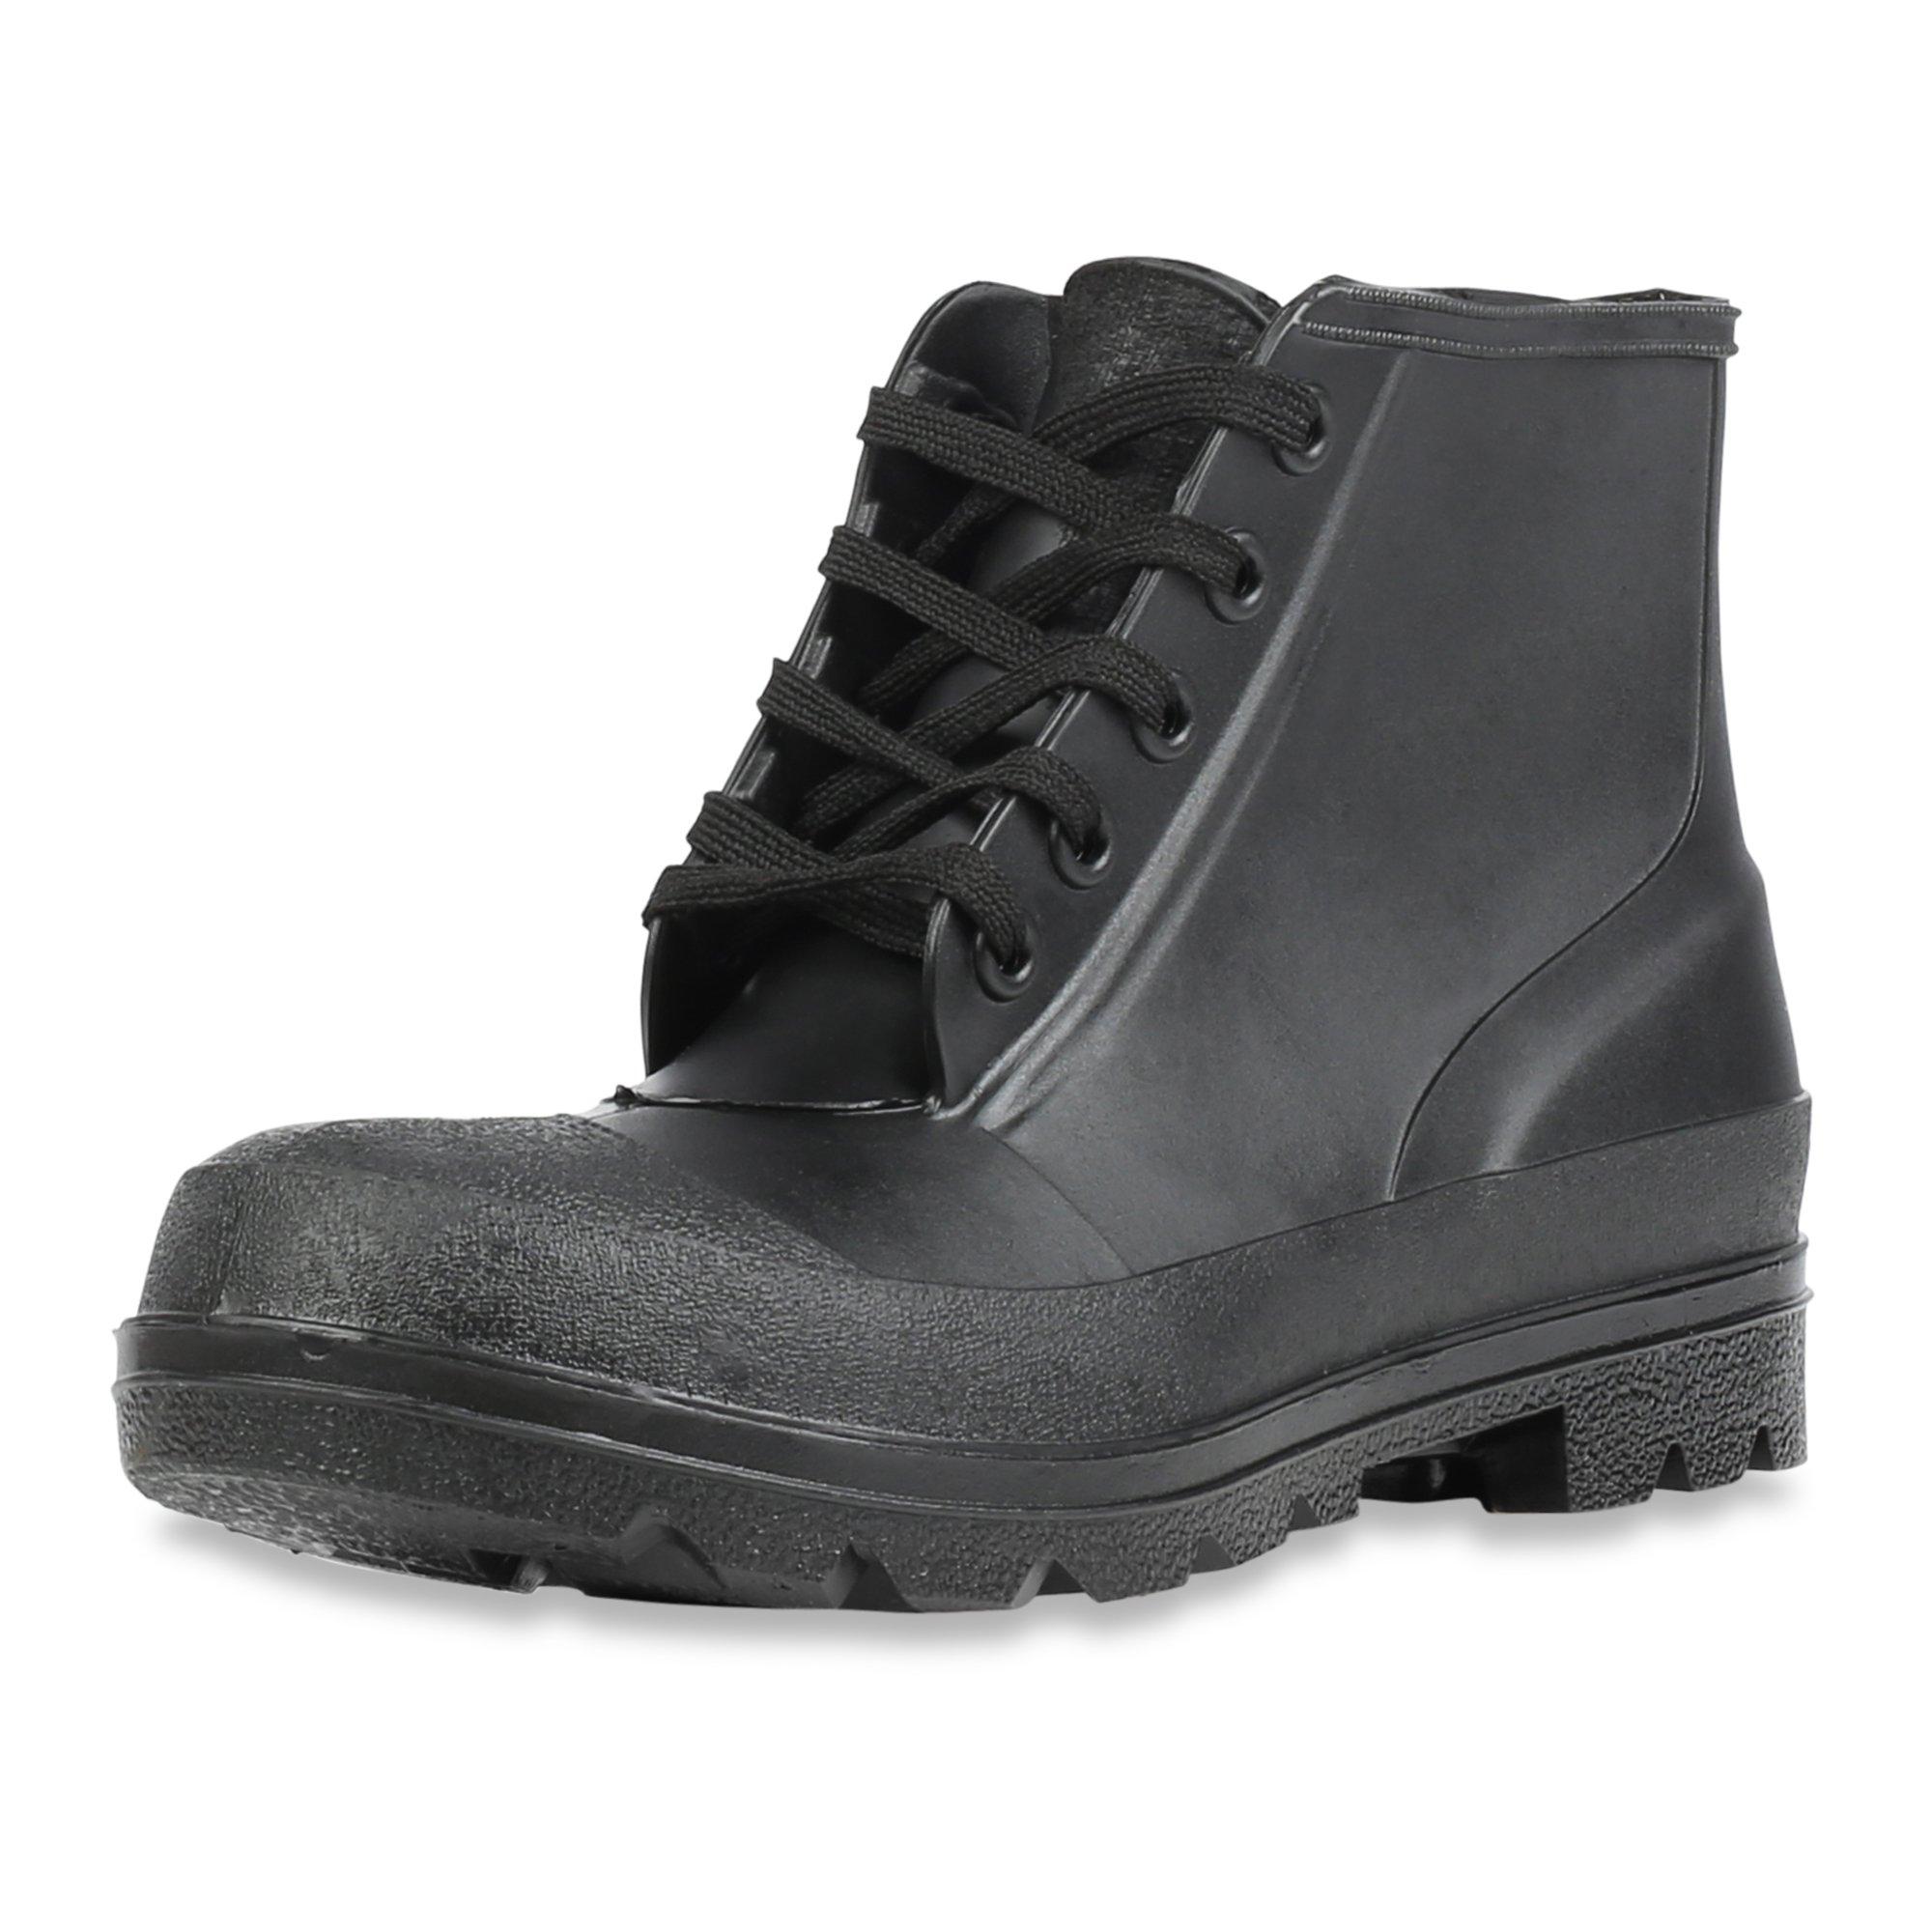 Servus Iron Duke 6'' PVC Polyblend Steel Toe Men's Work Shoes, Black (73104) by Honeywell